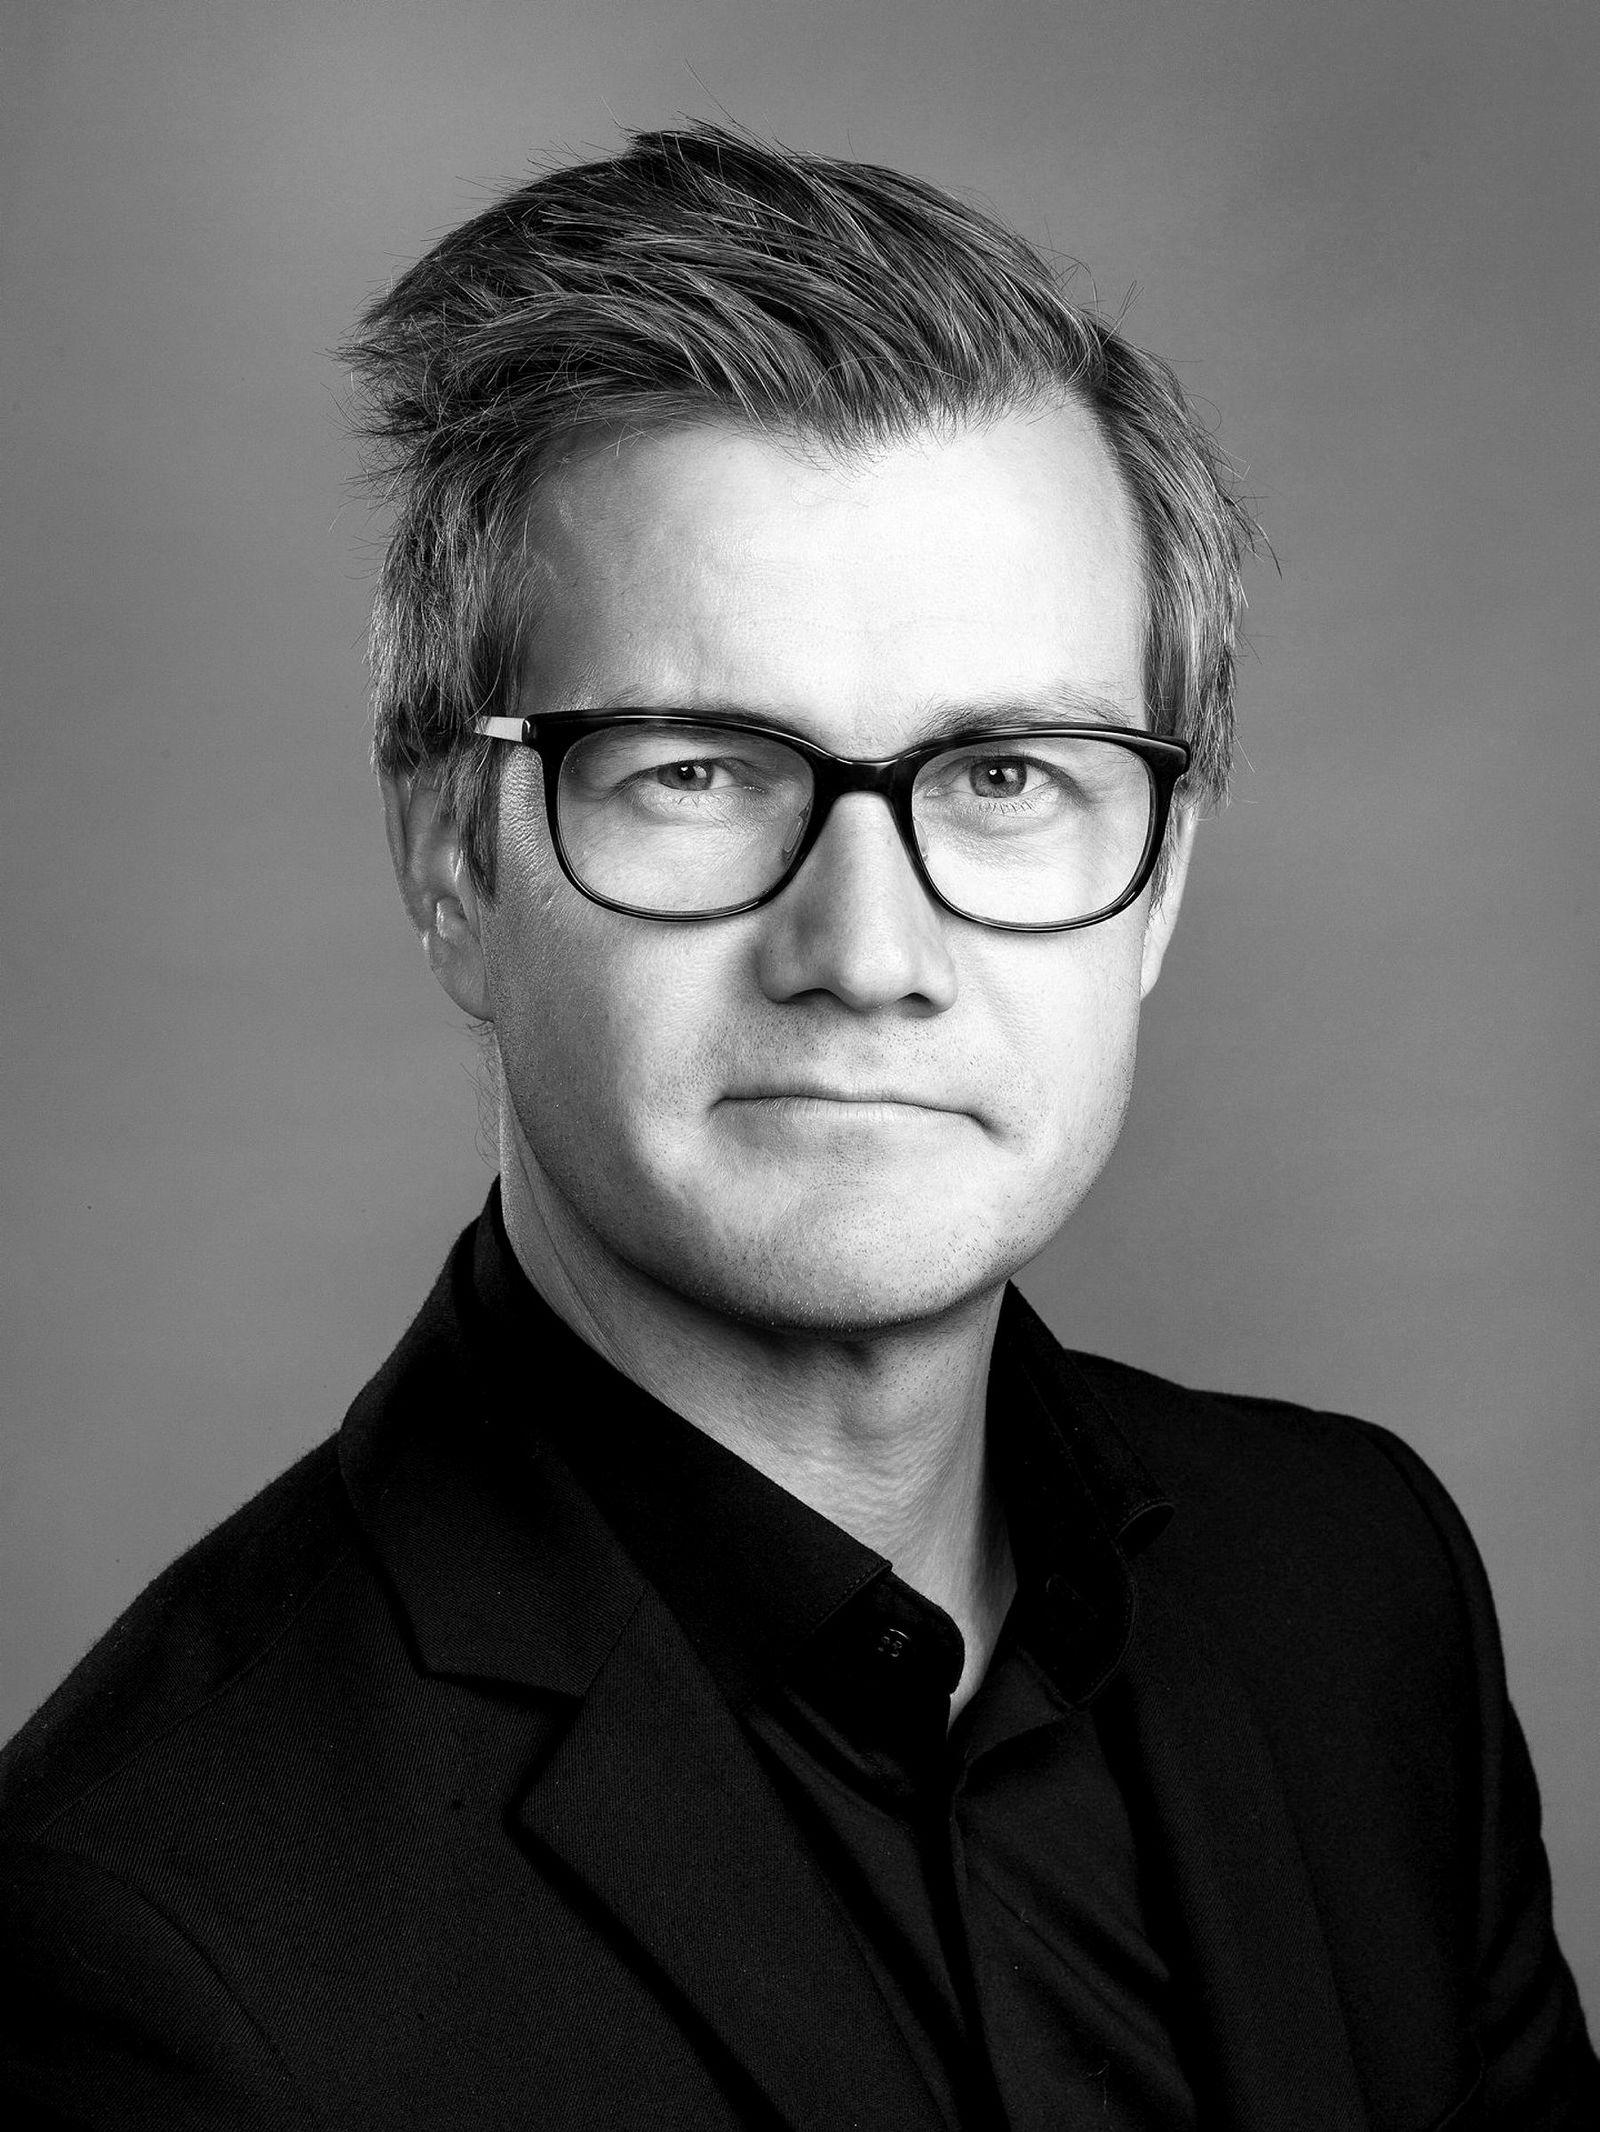 Gjermund Rongved